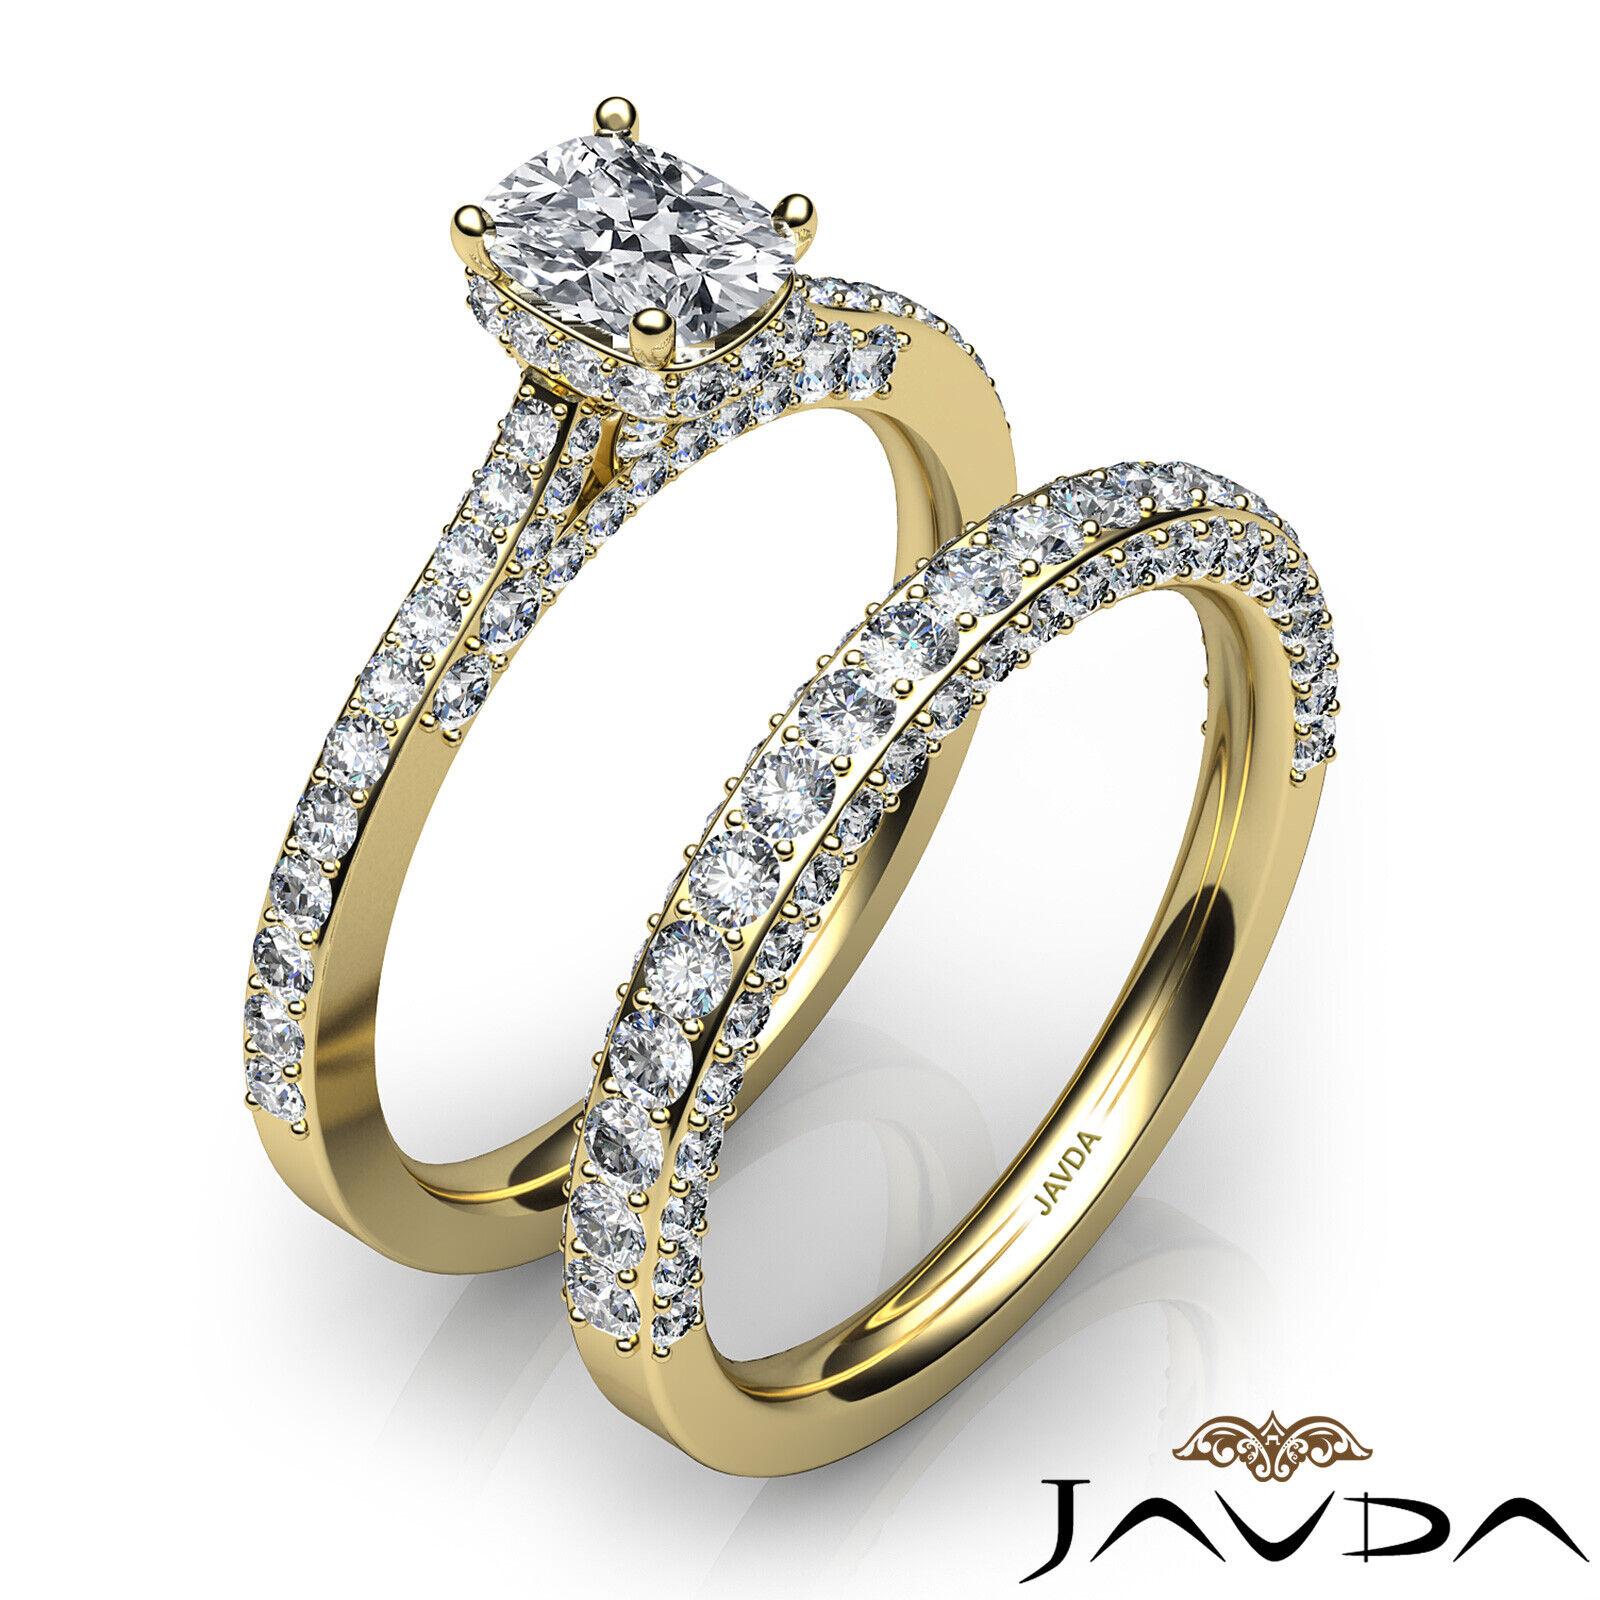 2.85ctw Pave Circa Halo Bridal Cushion Diamond Engagement Ring GIA F-VS1 W Gold 9